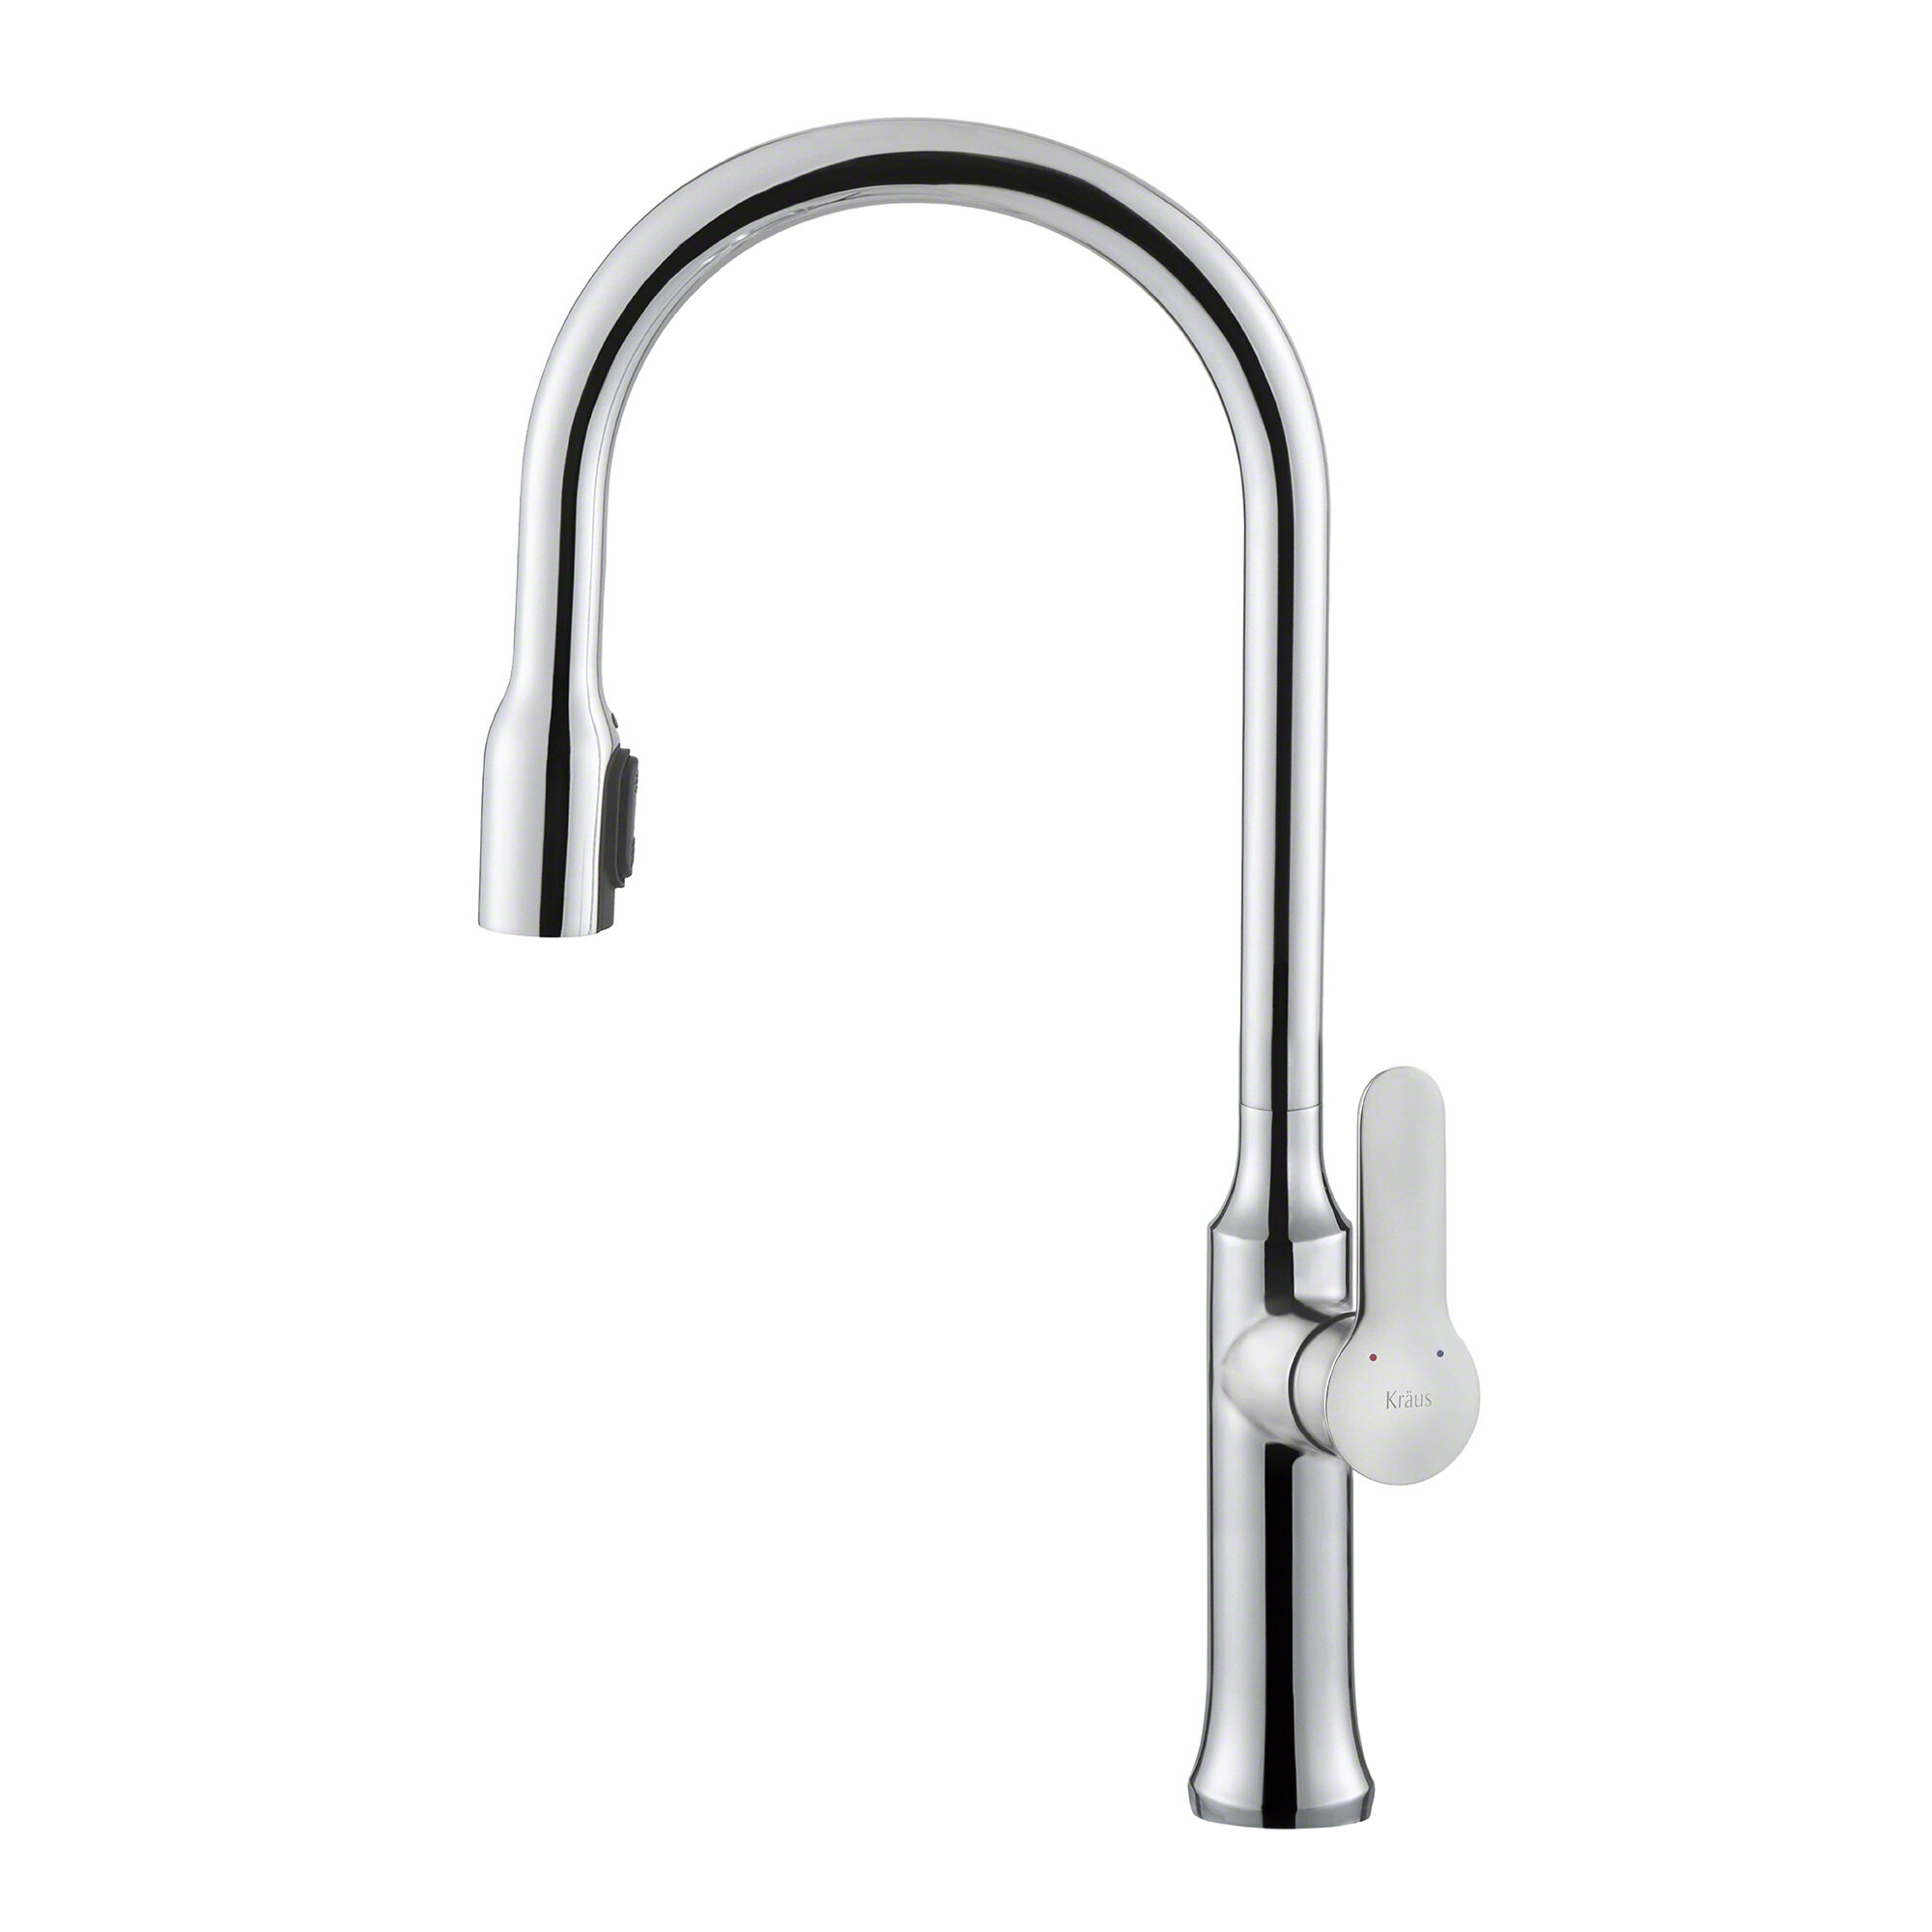 allora faucet kitchen lightbox c usa handle single chrome a product faucets hose